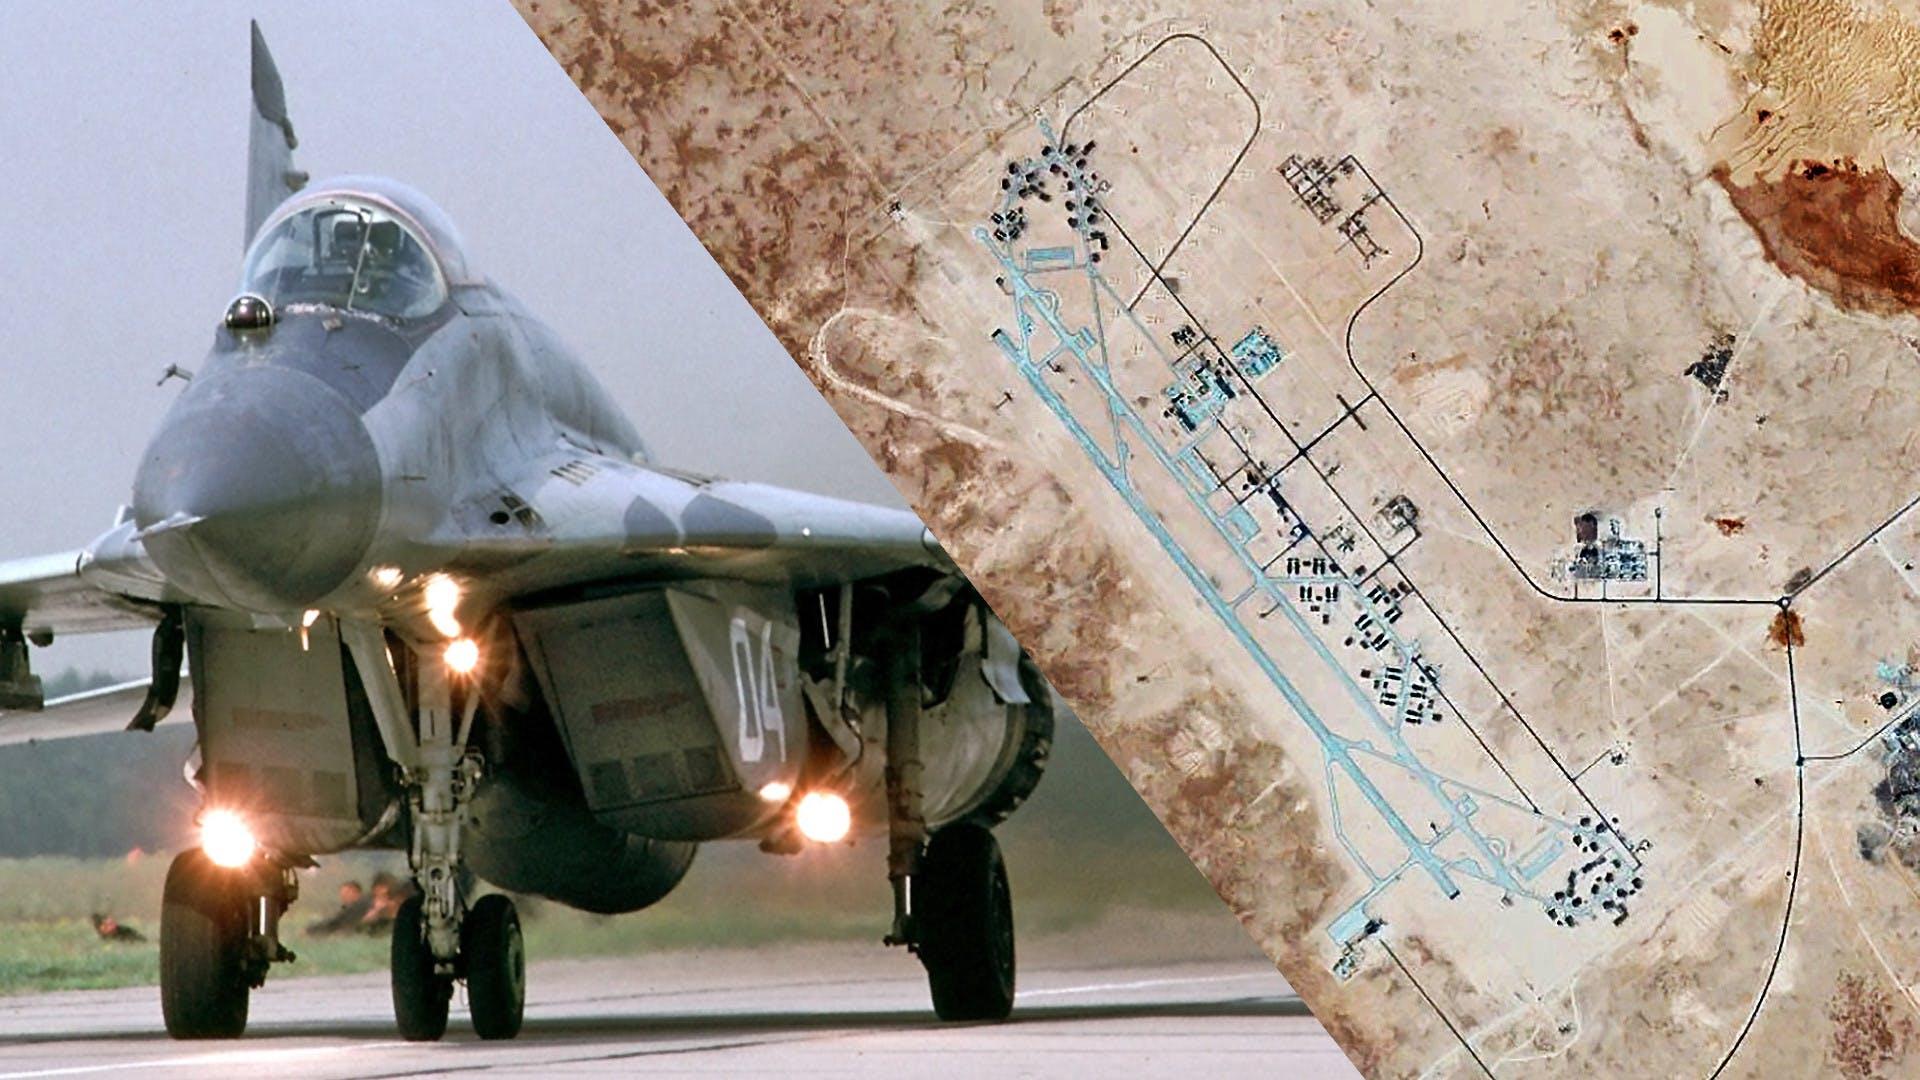 Nέο πλήγμα για την Άγκυρα-Ρωσικής κατασκευής MiG-29 κατέστρεψε αμερικανικό αντιαεροπορικό σύστημα ΜΙΜ-23 Hawk πλησίον της Σύρτης